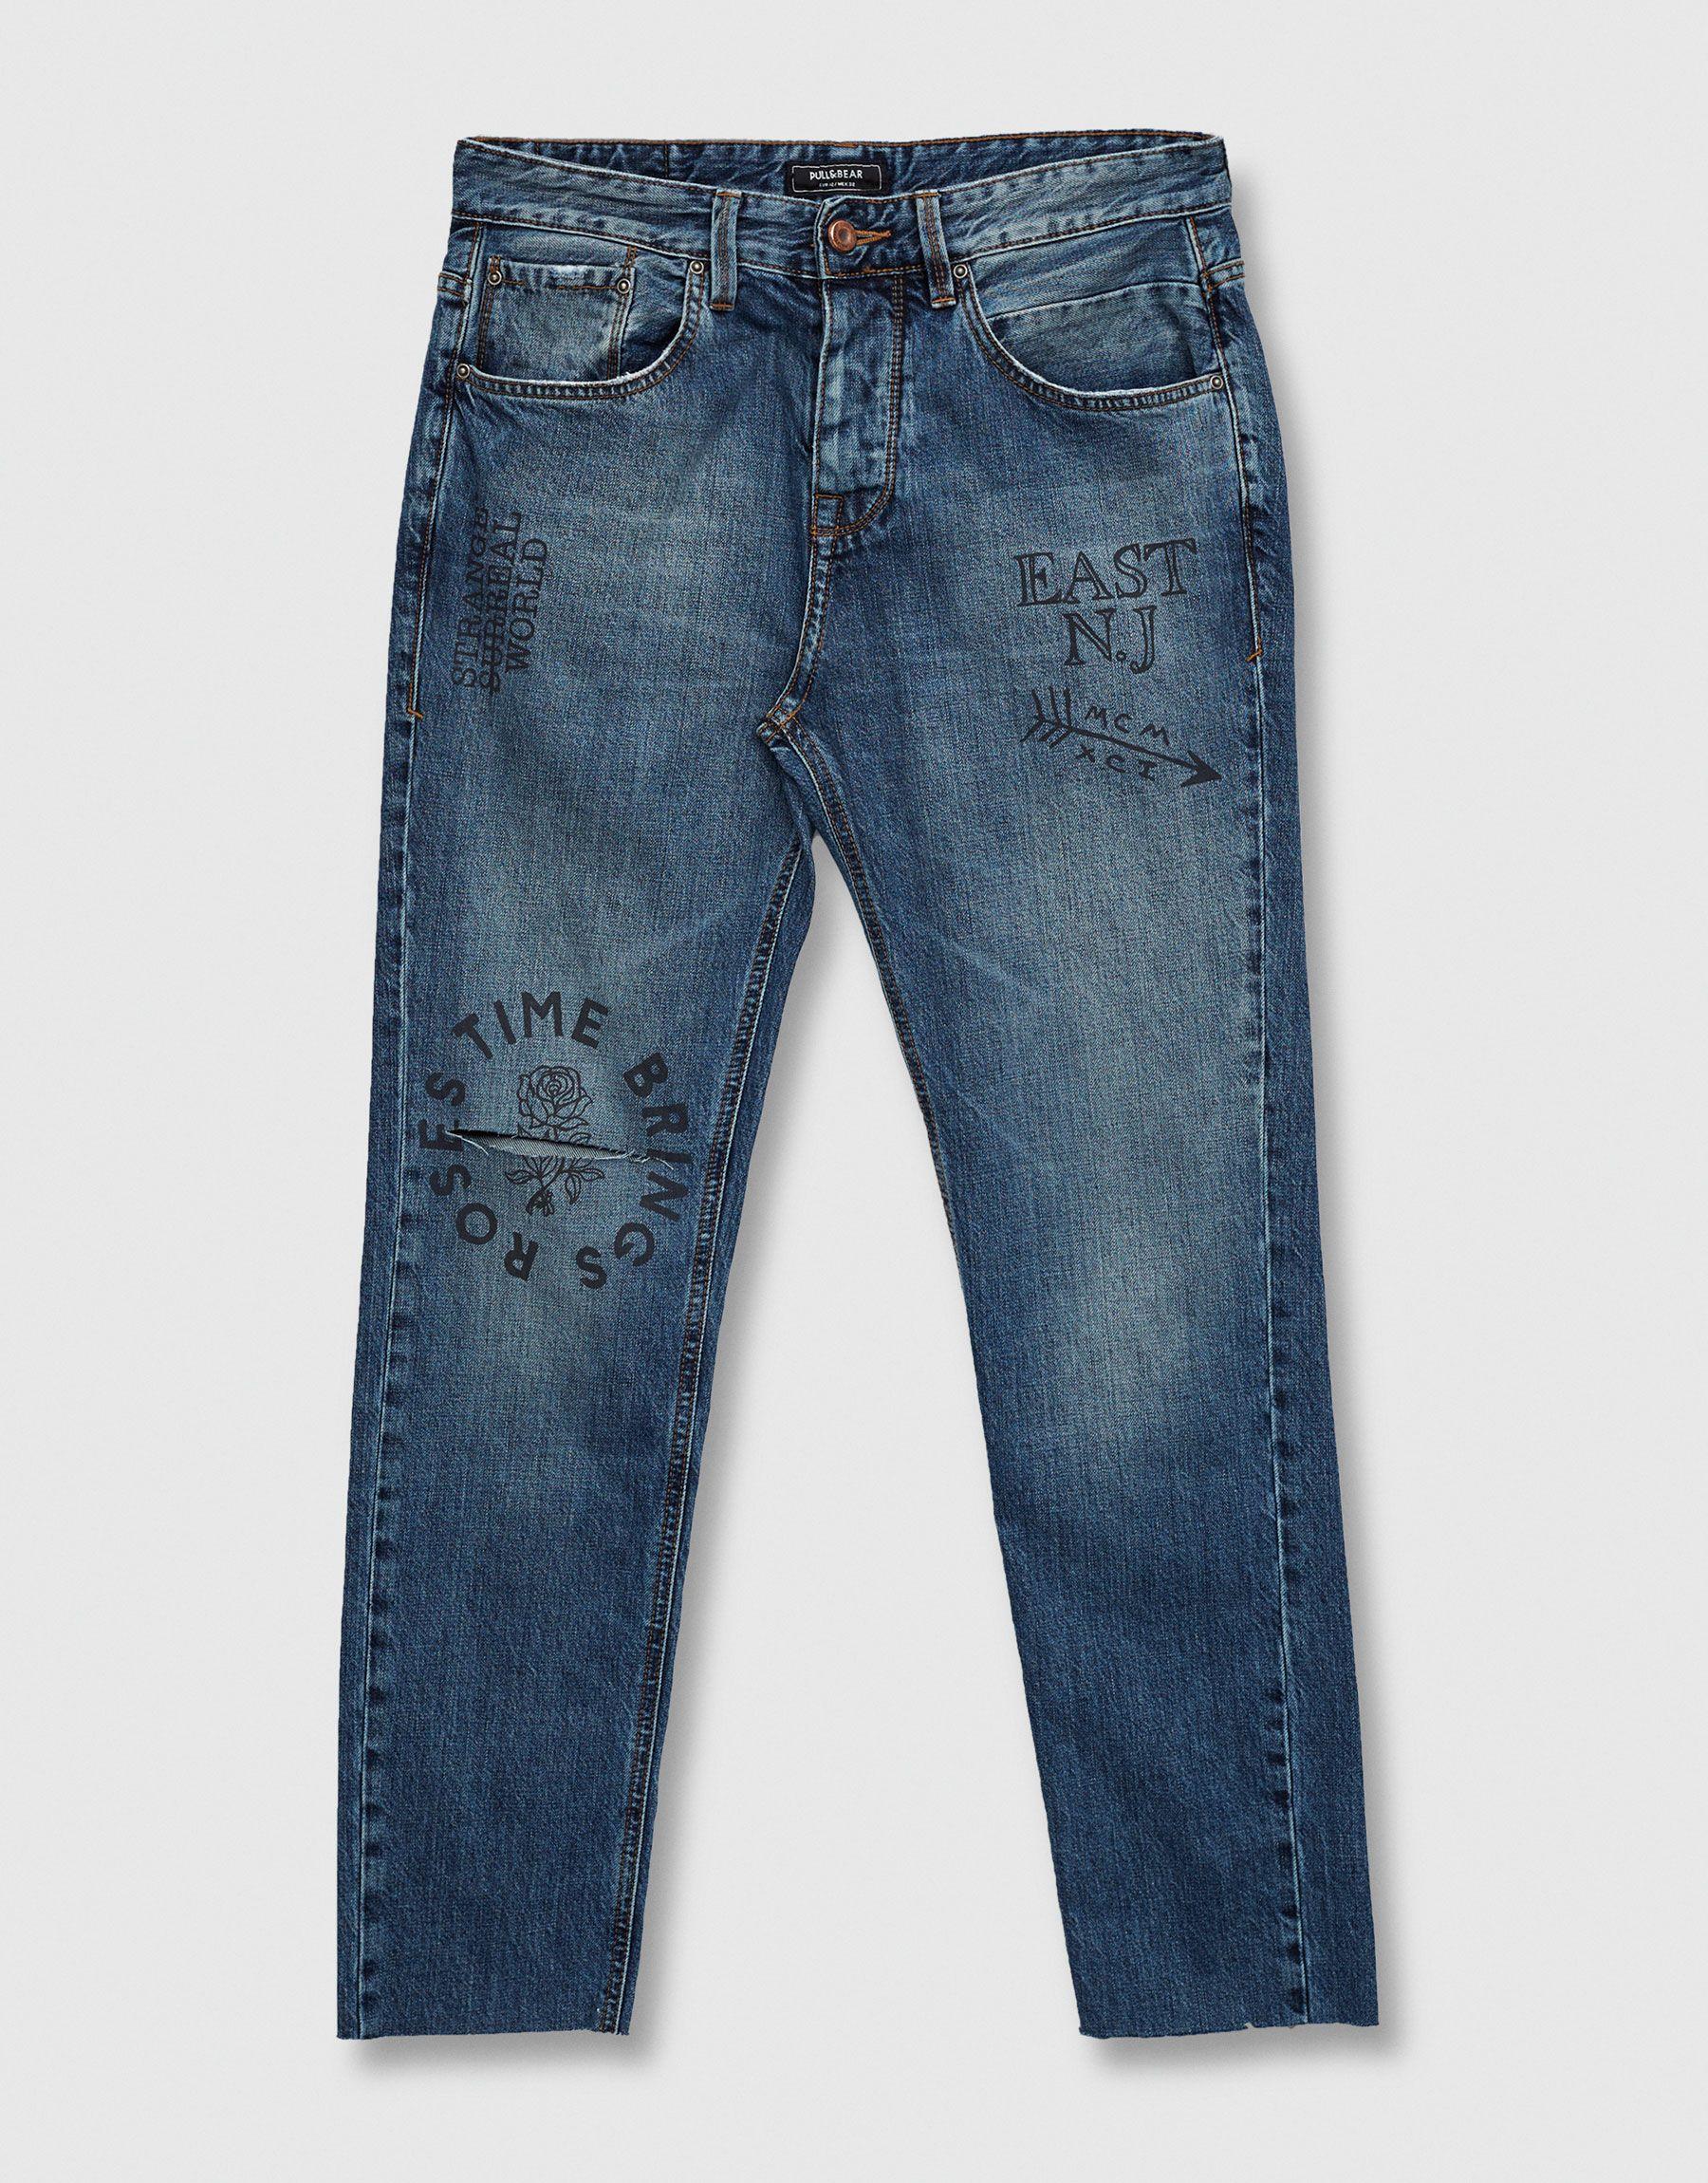 Jeans Slim Fit Print Texto Jeans Ropa Ropa Hombre Pull Bear Espana Moda Estilo Moda Pantalones